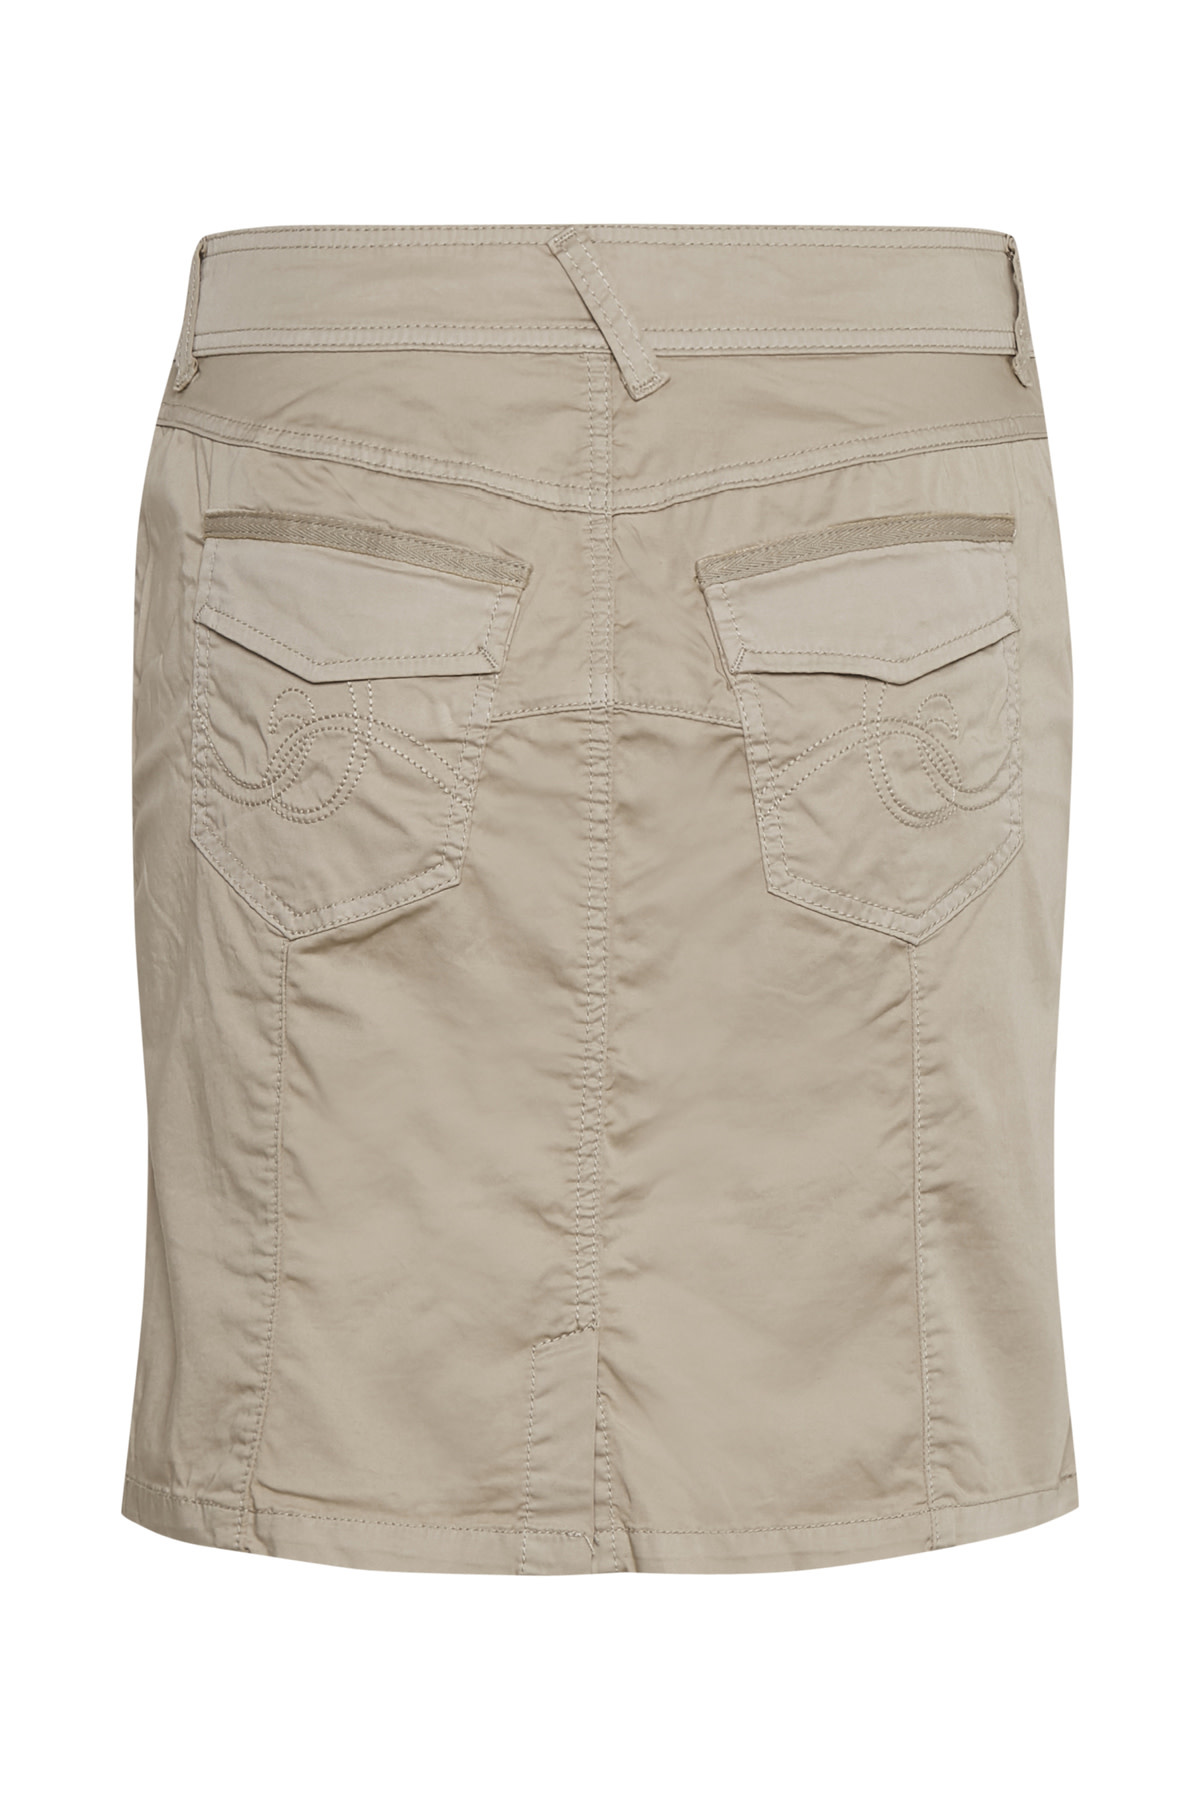 Alba Skirt - Feather Gray